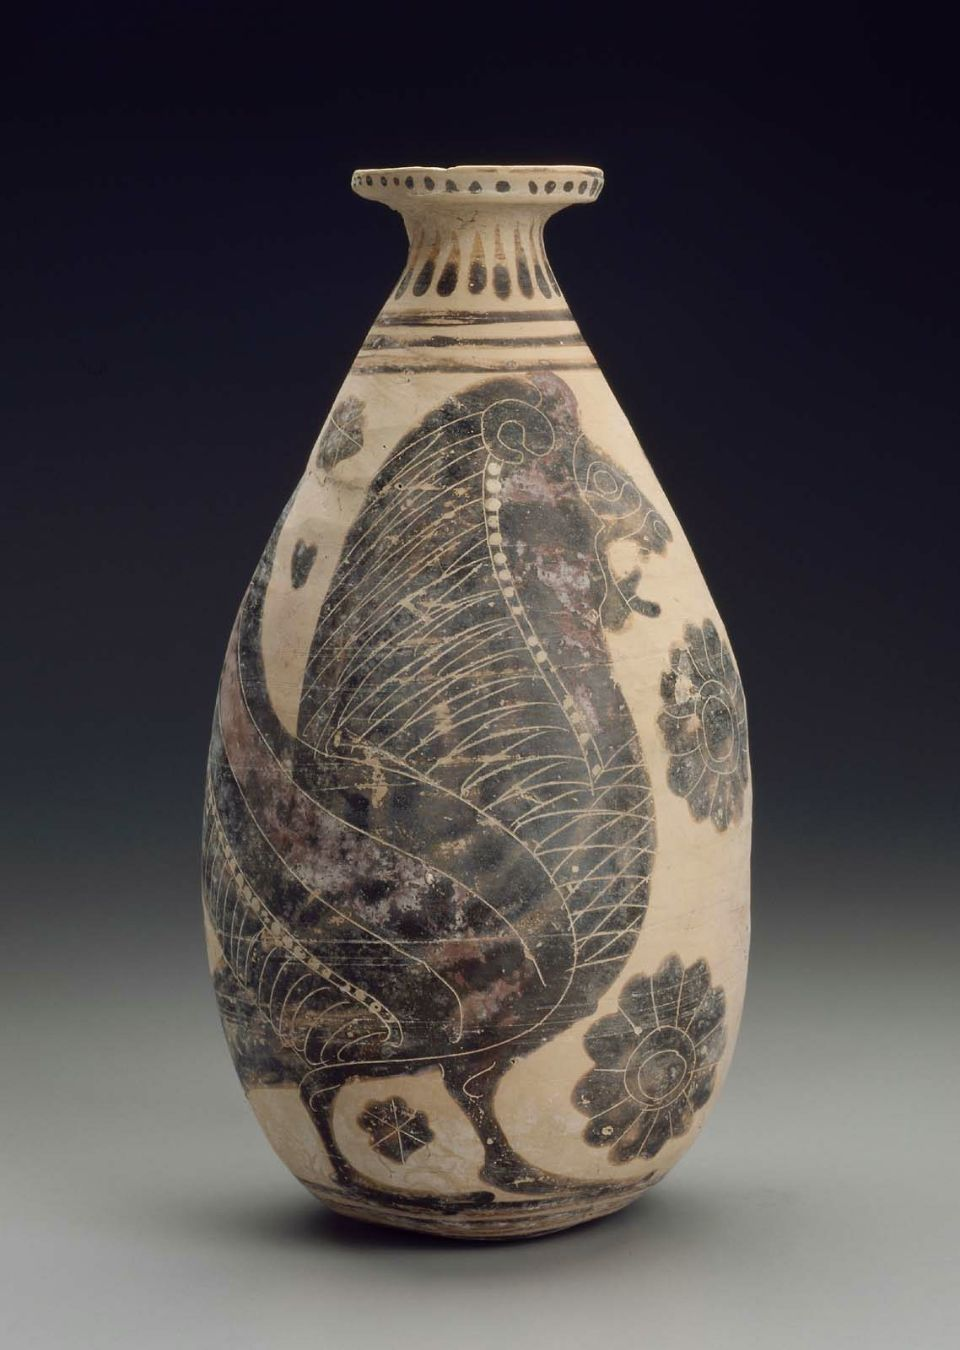 Oil Flask Alabastron Culture Greek Period Archaic